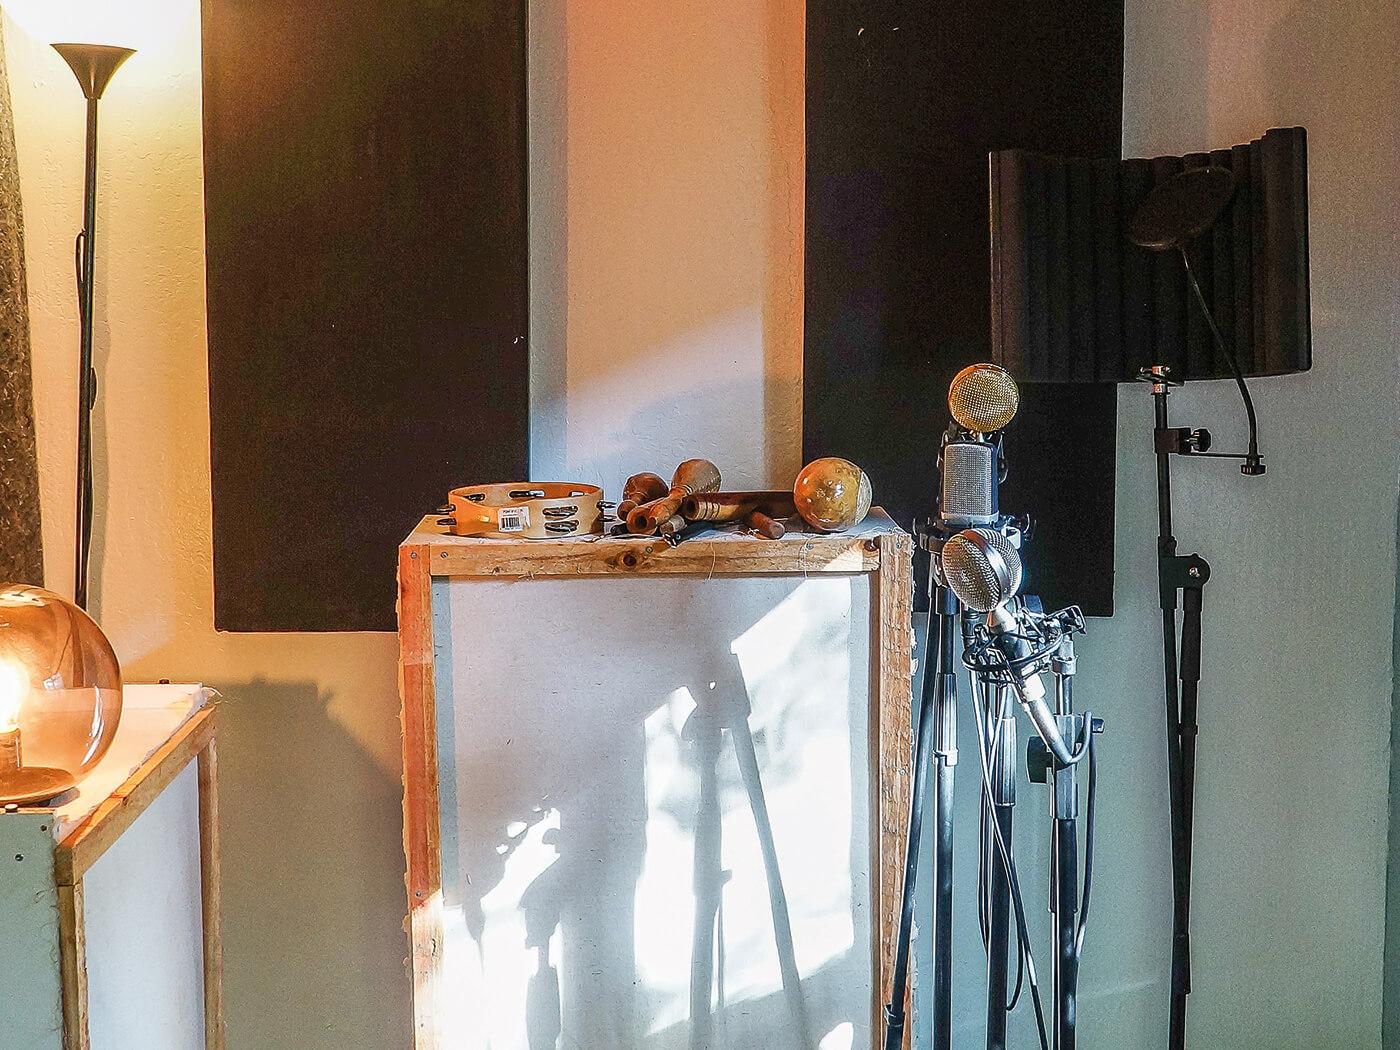 Show Off Your Studio, Matt McDavid